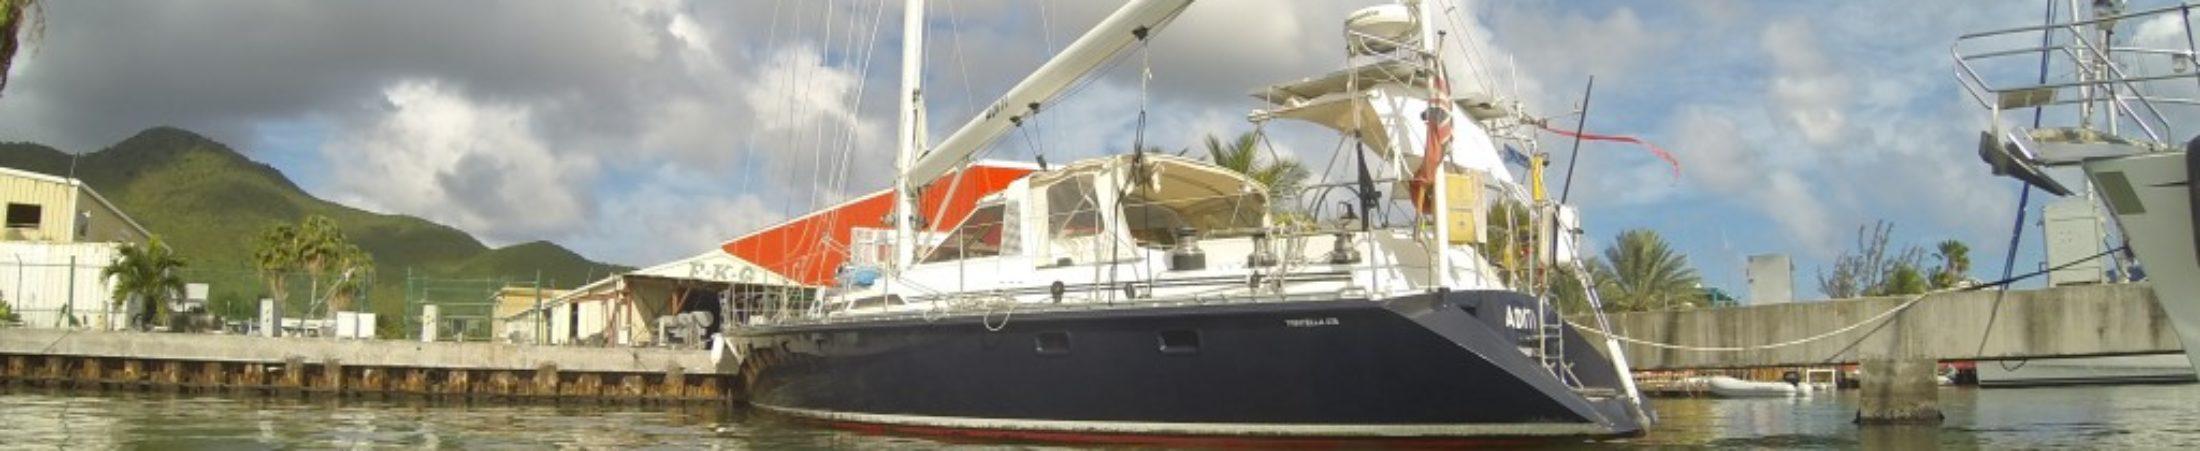 Yacht Aditi